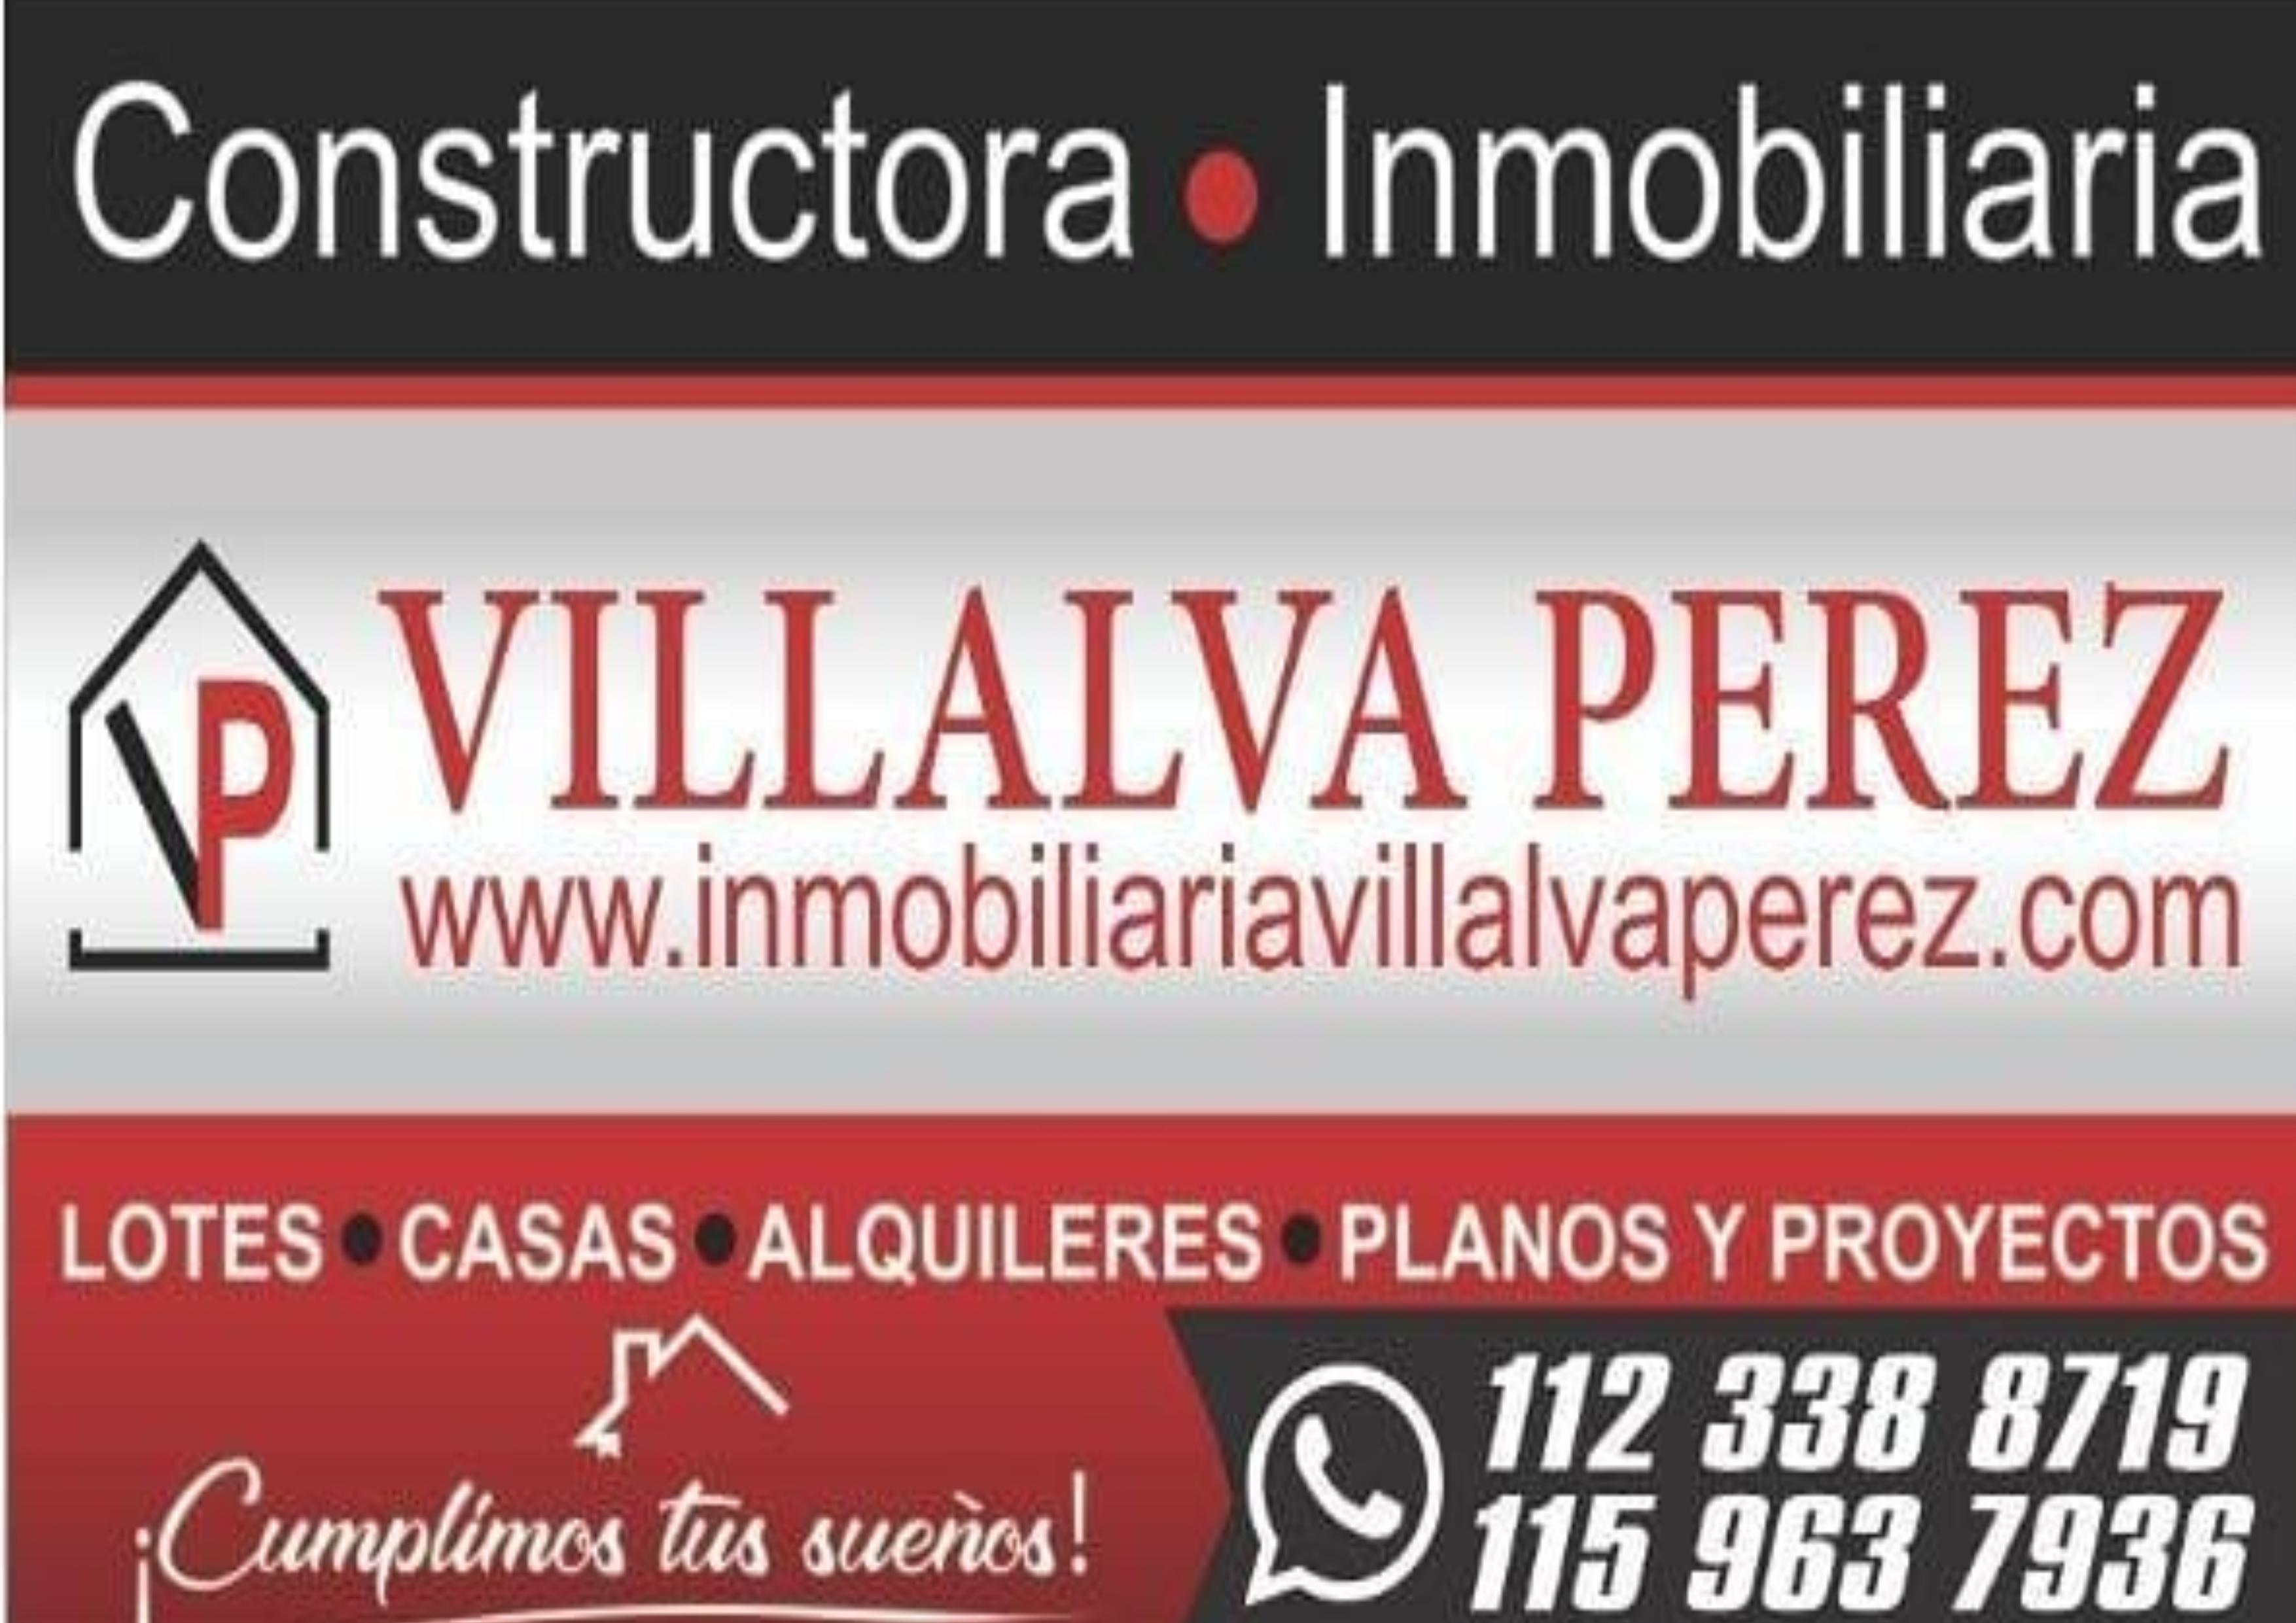 Villalba Perez